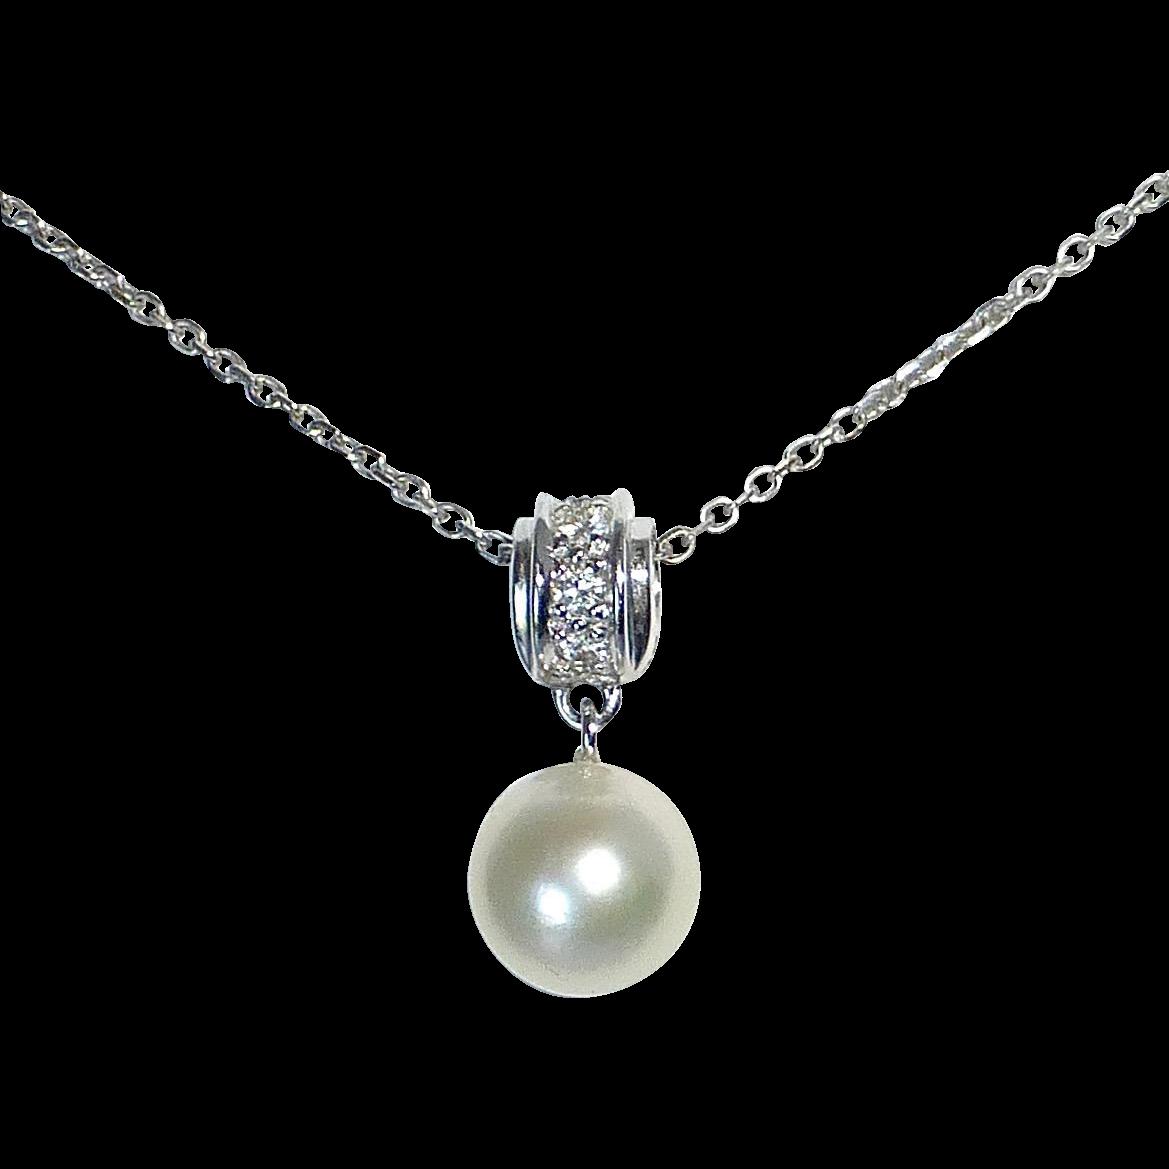 14k White Gold Pearl & Diamond Drop Pendant Necklace